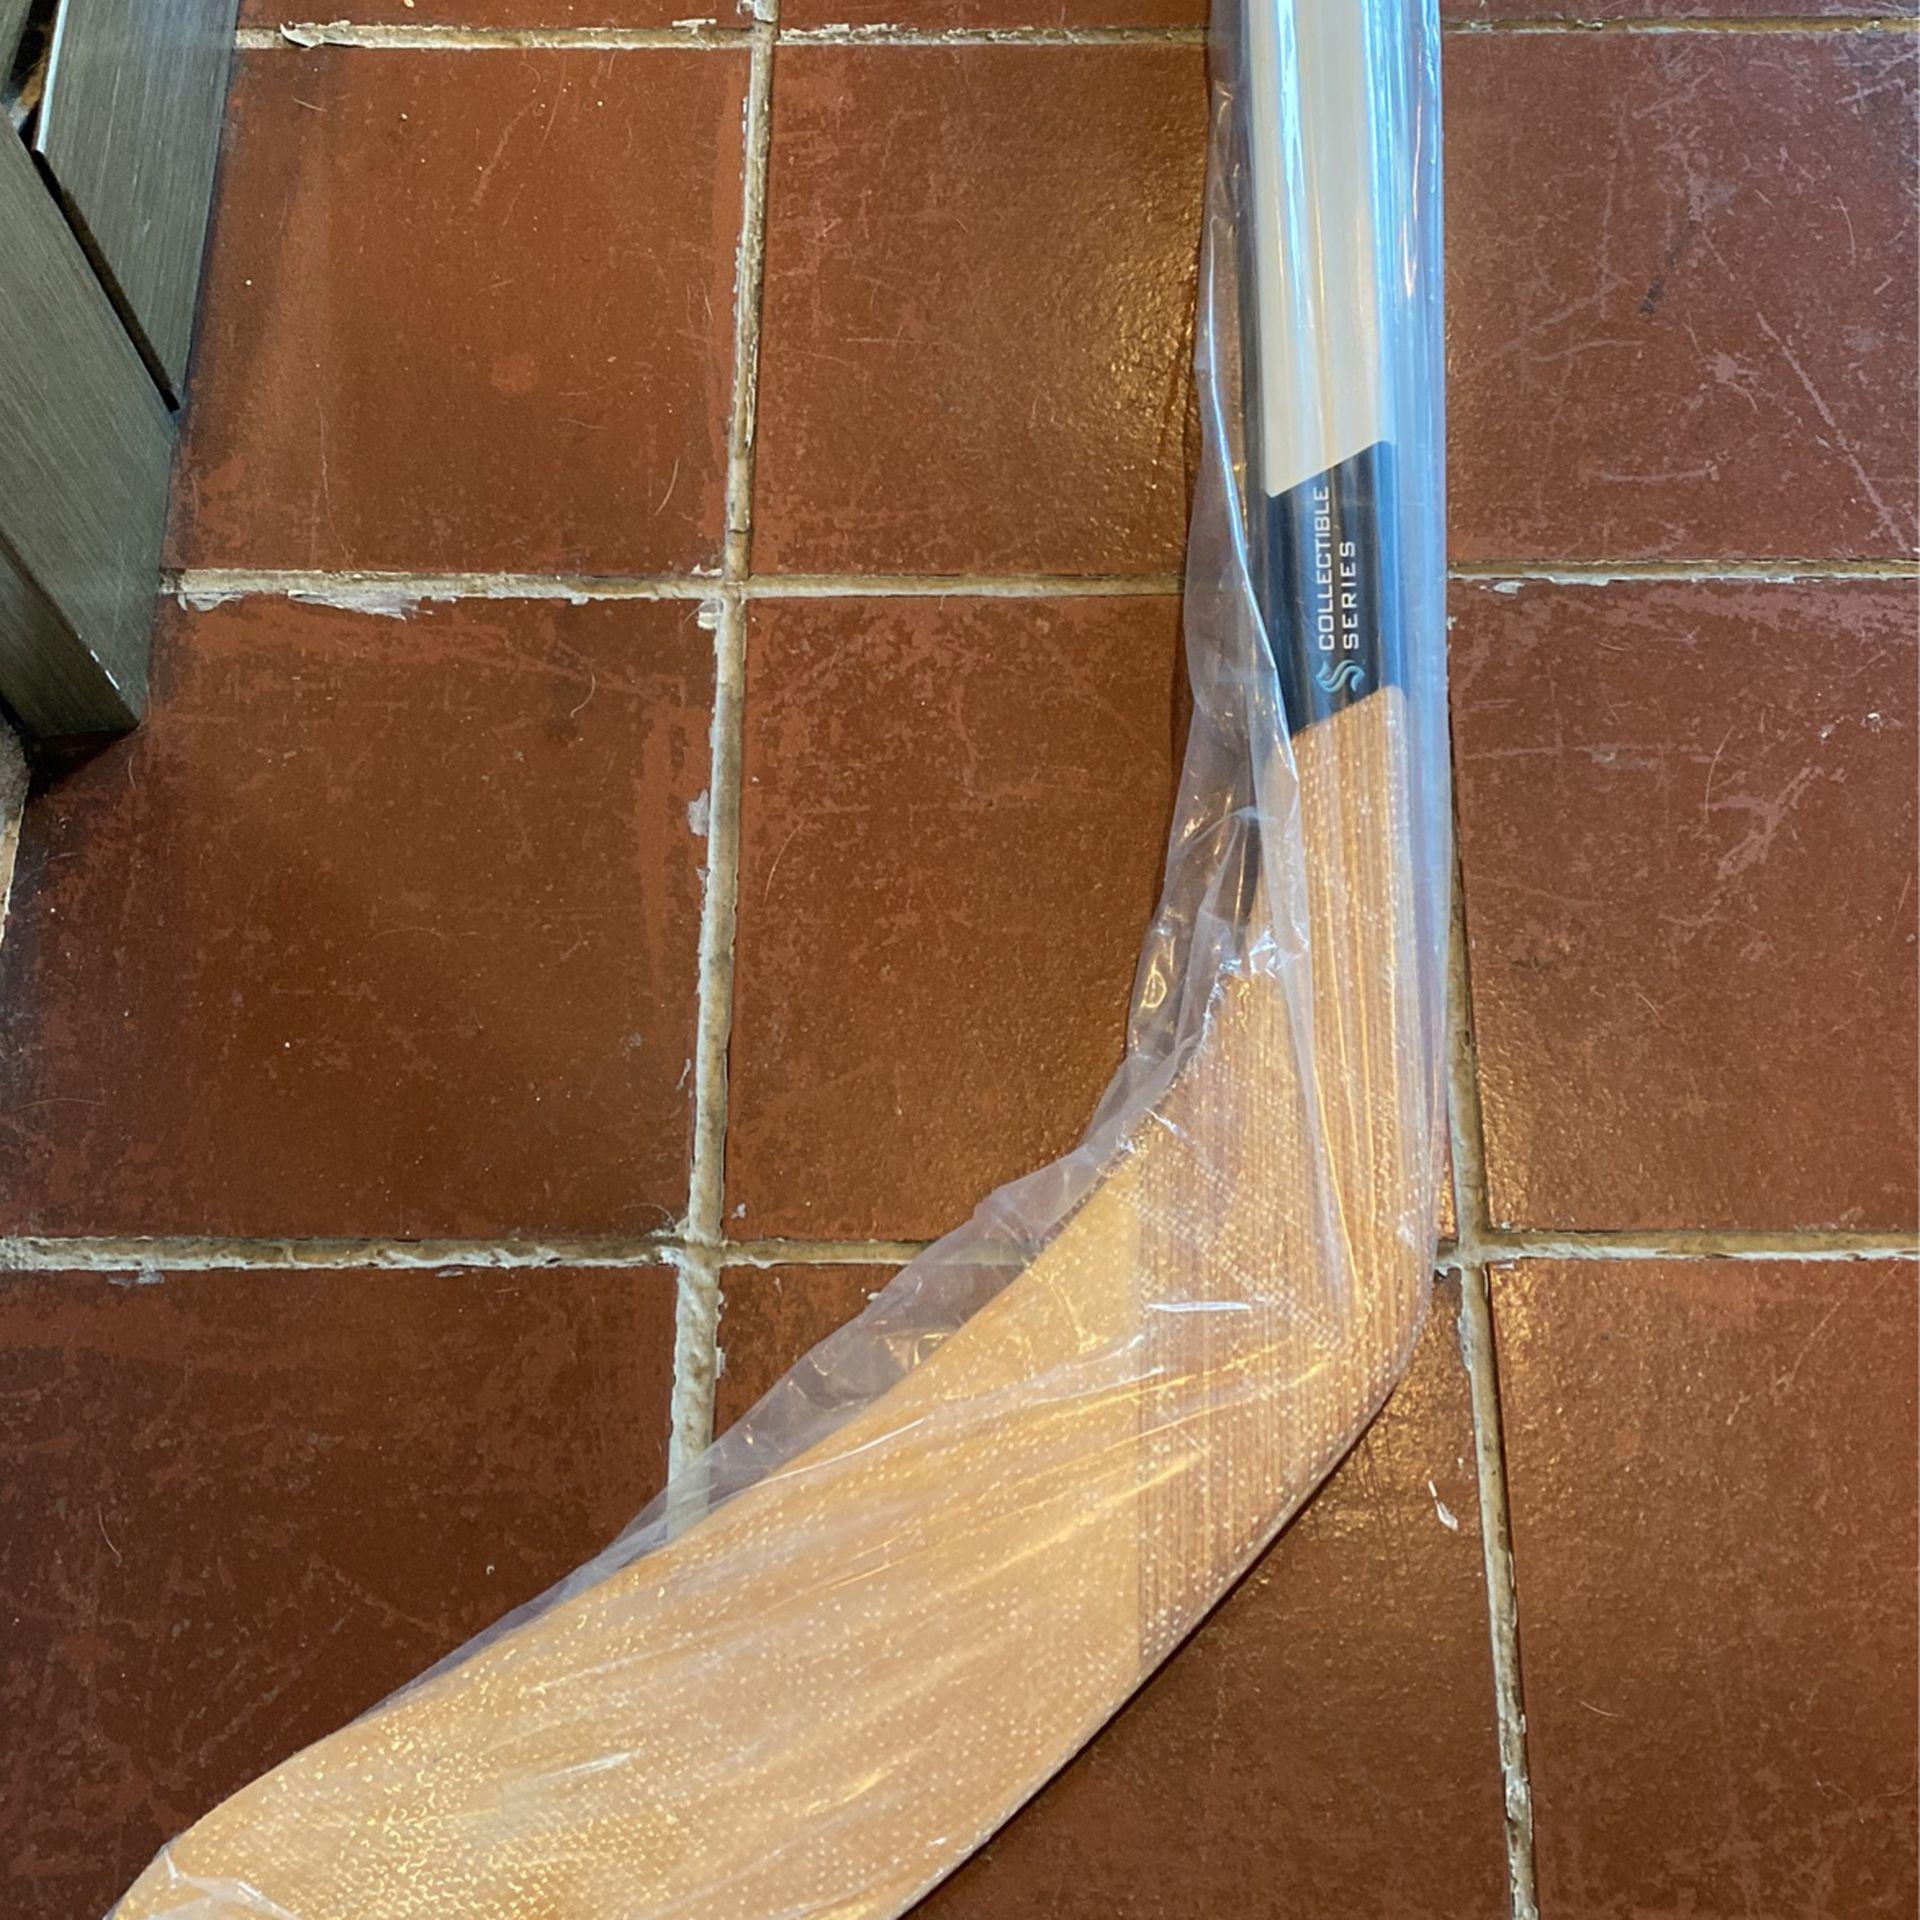 Kraken Inaugural Season Hockey stick